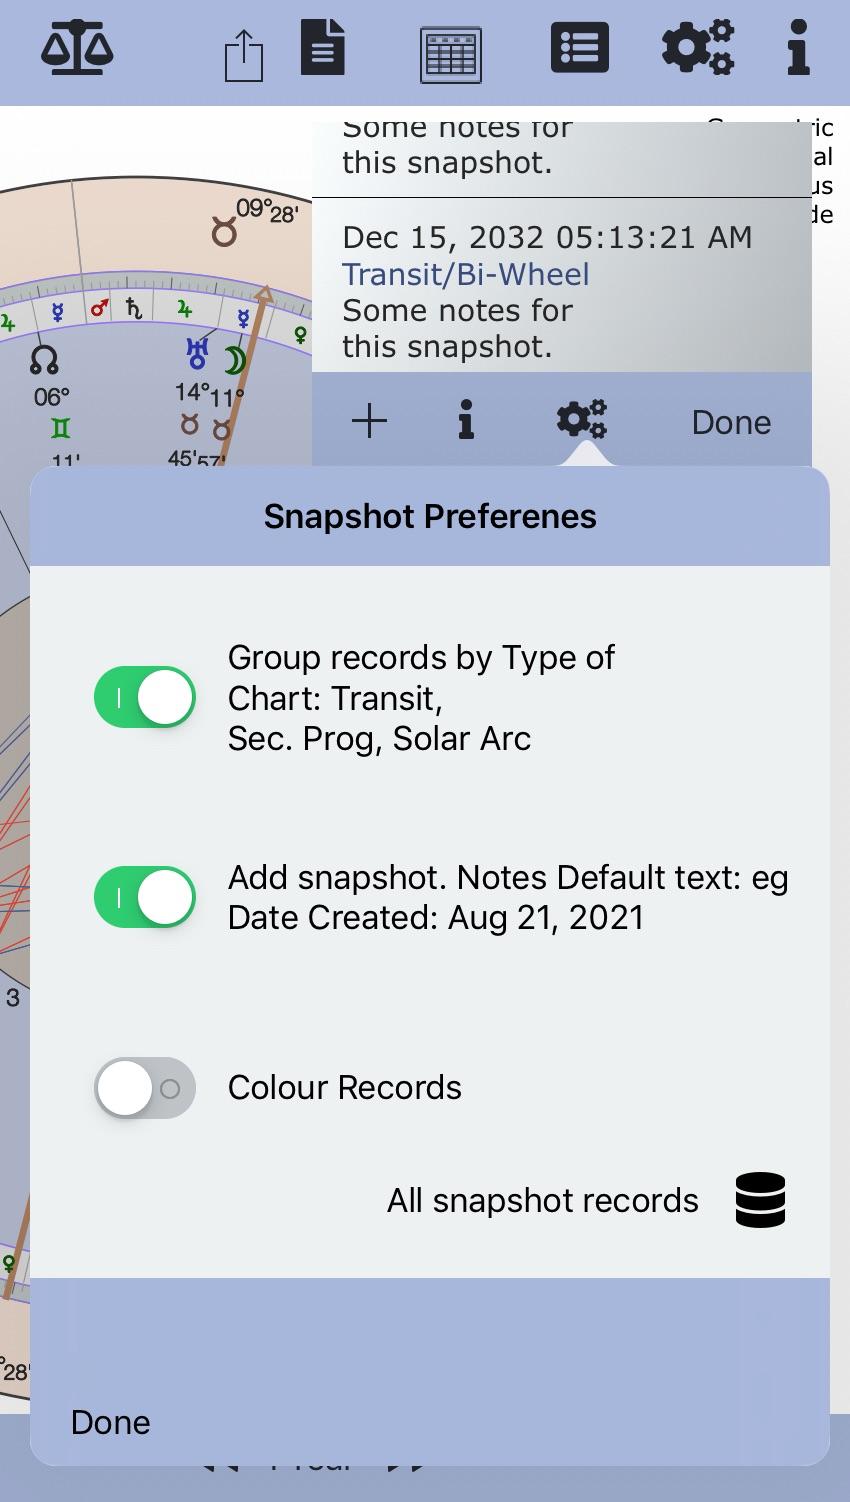 Snapshot Preferences